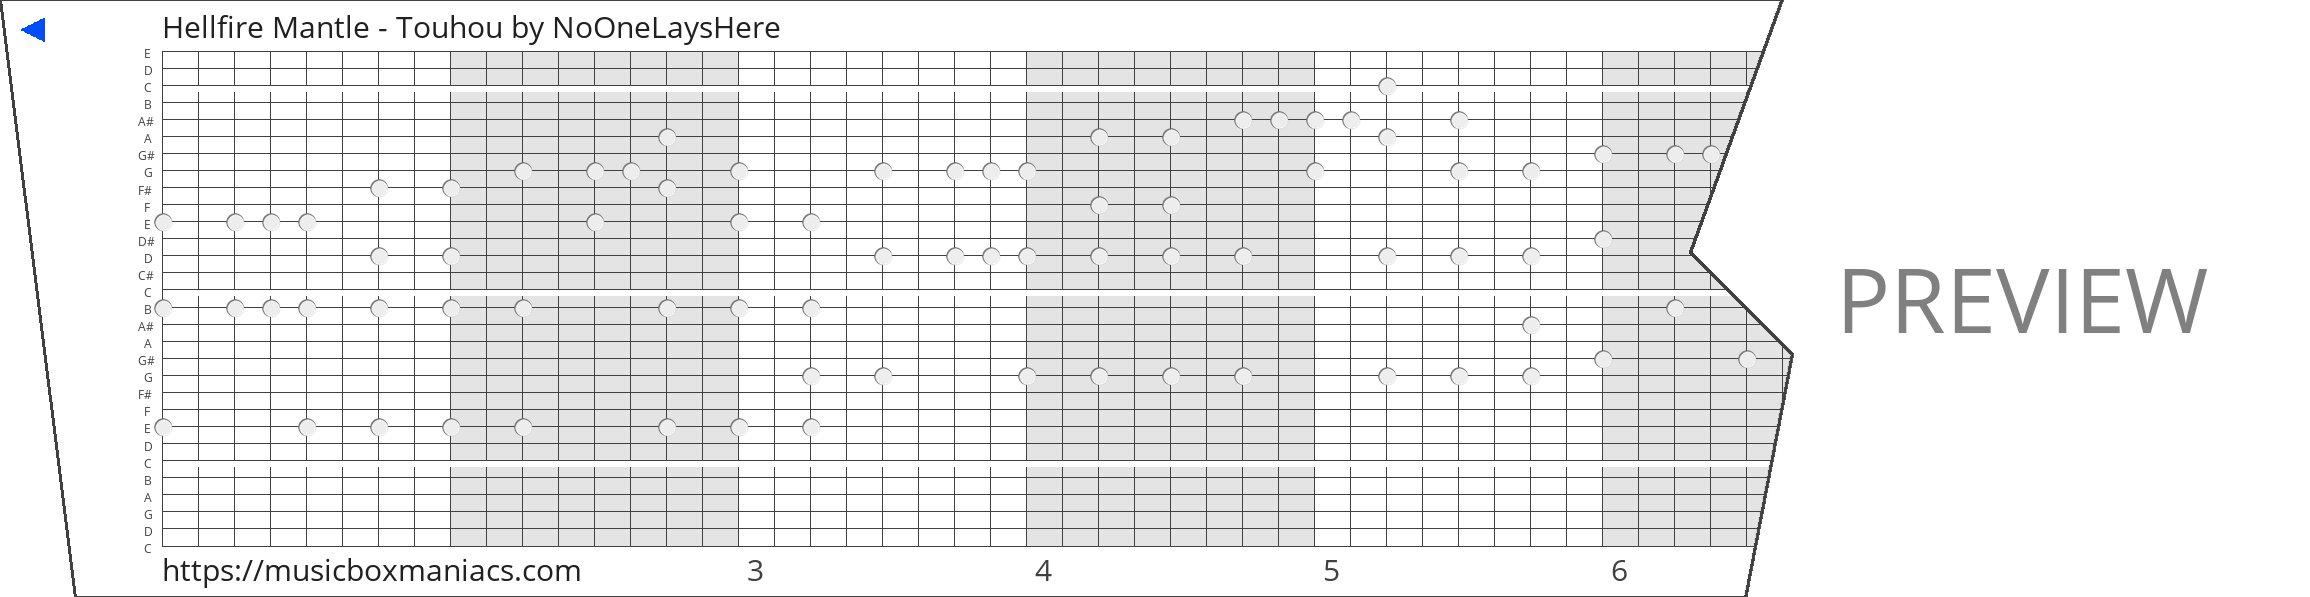 Hellfire Mantle - Touhou 30 note music box paper strip